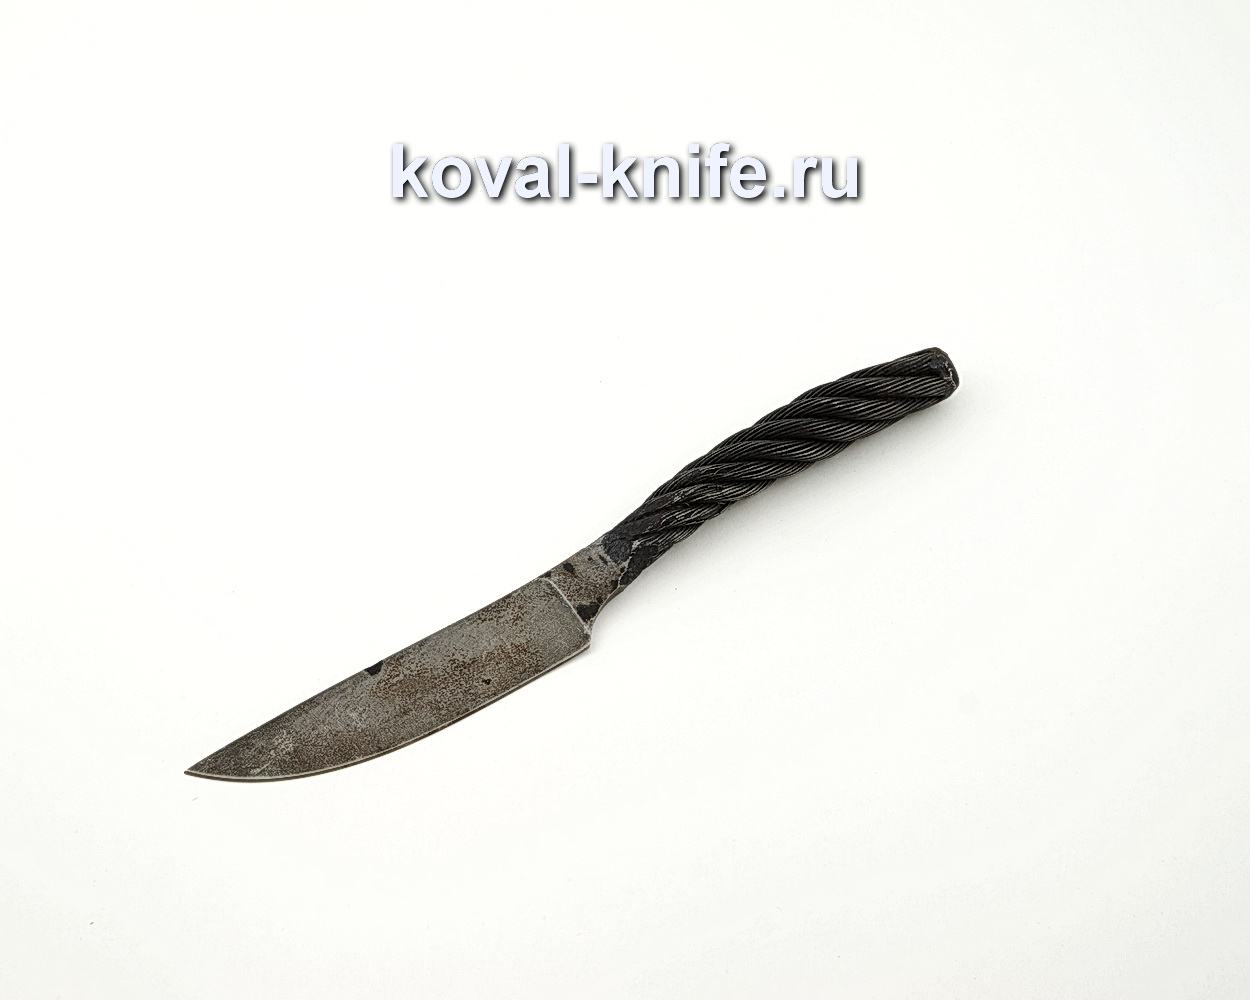 Нож из троса A597